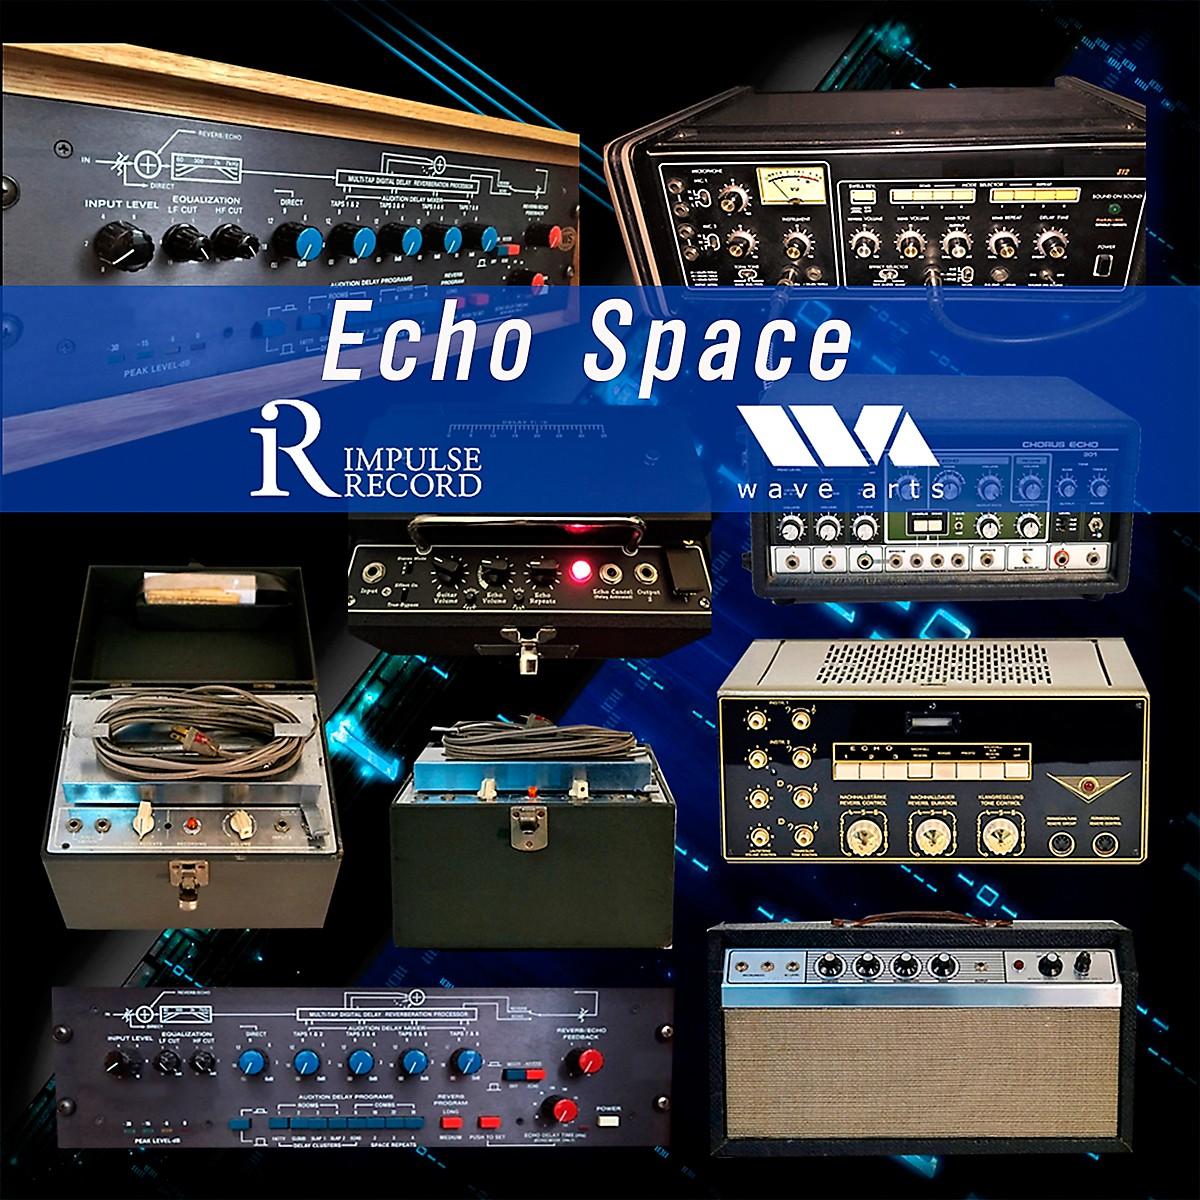 Impulse Record Echo Space